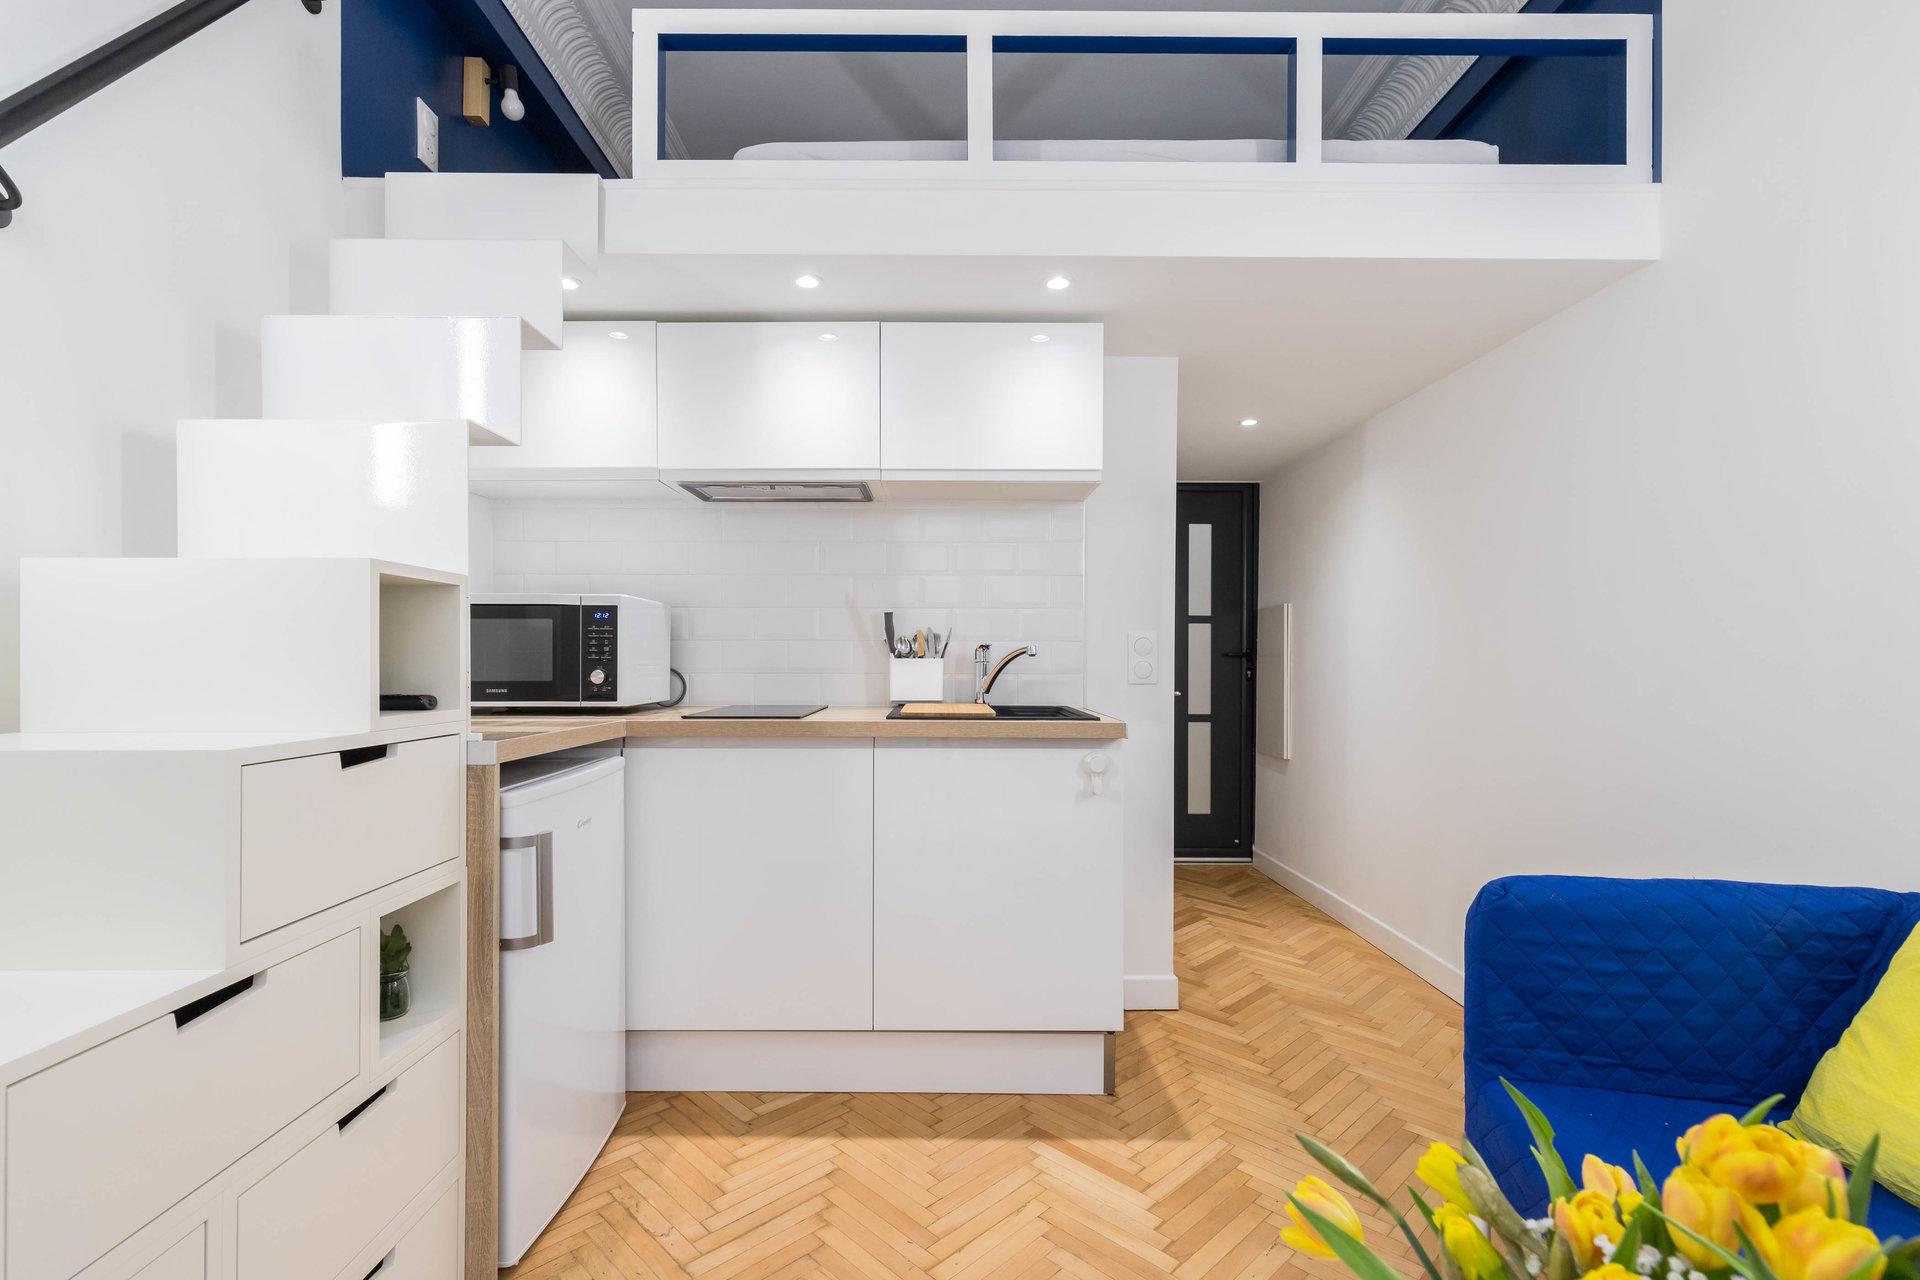 Affitto Appartamento - Nizza (Nice) Vernier